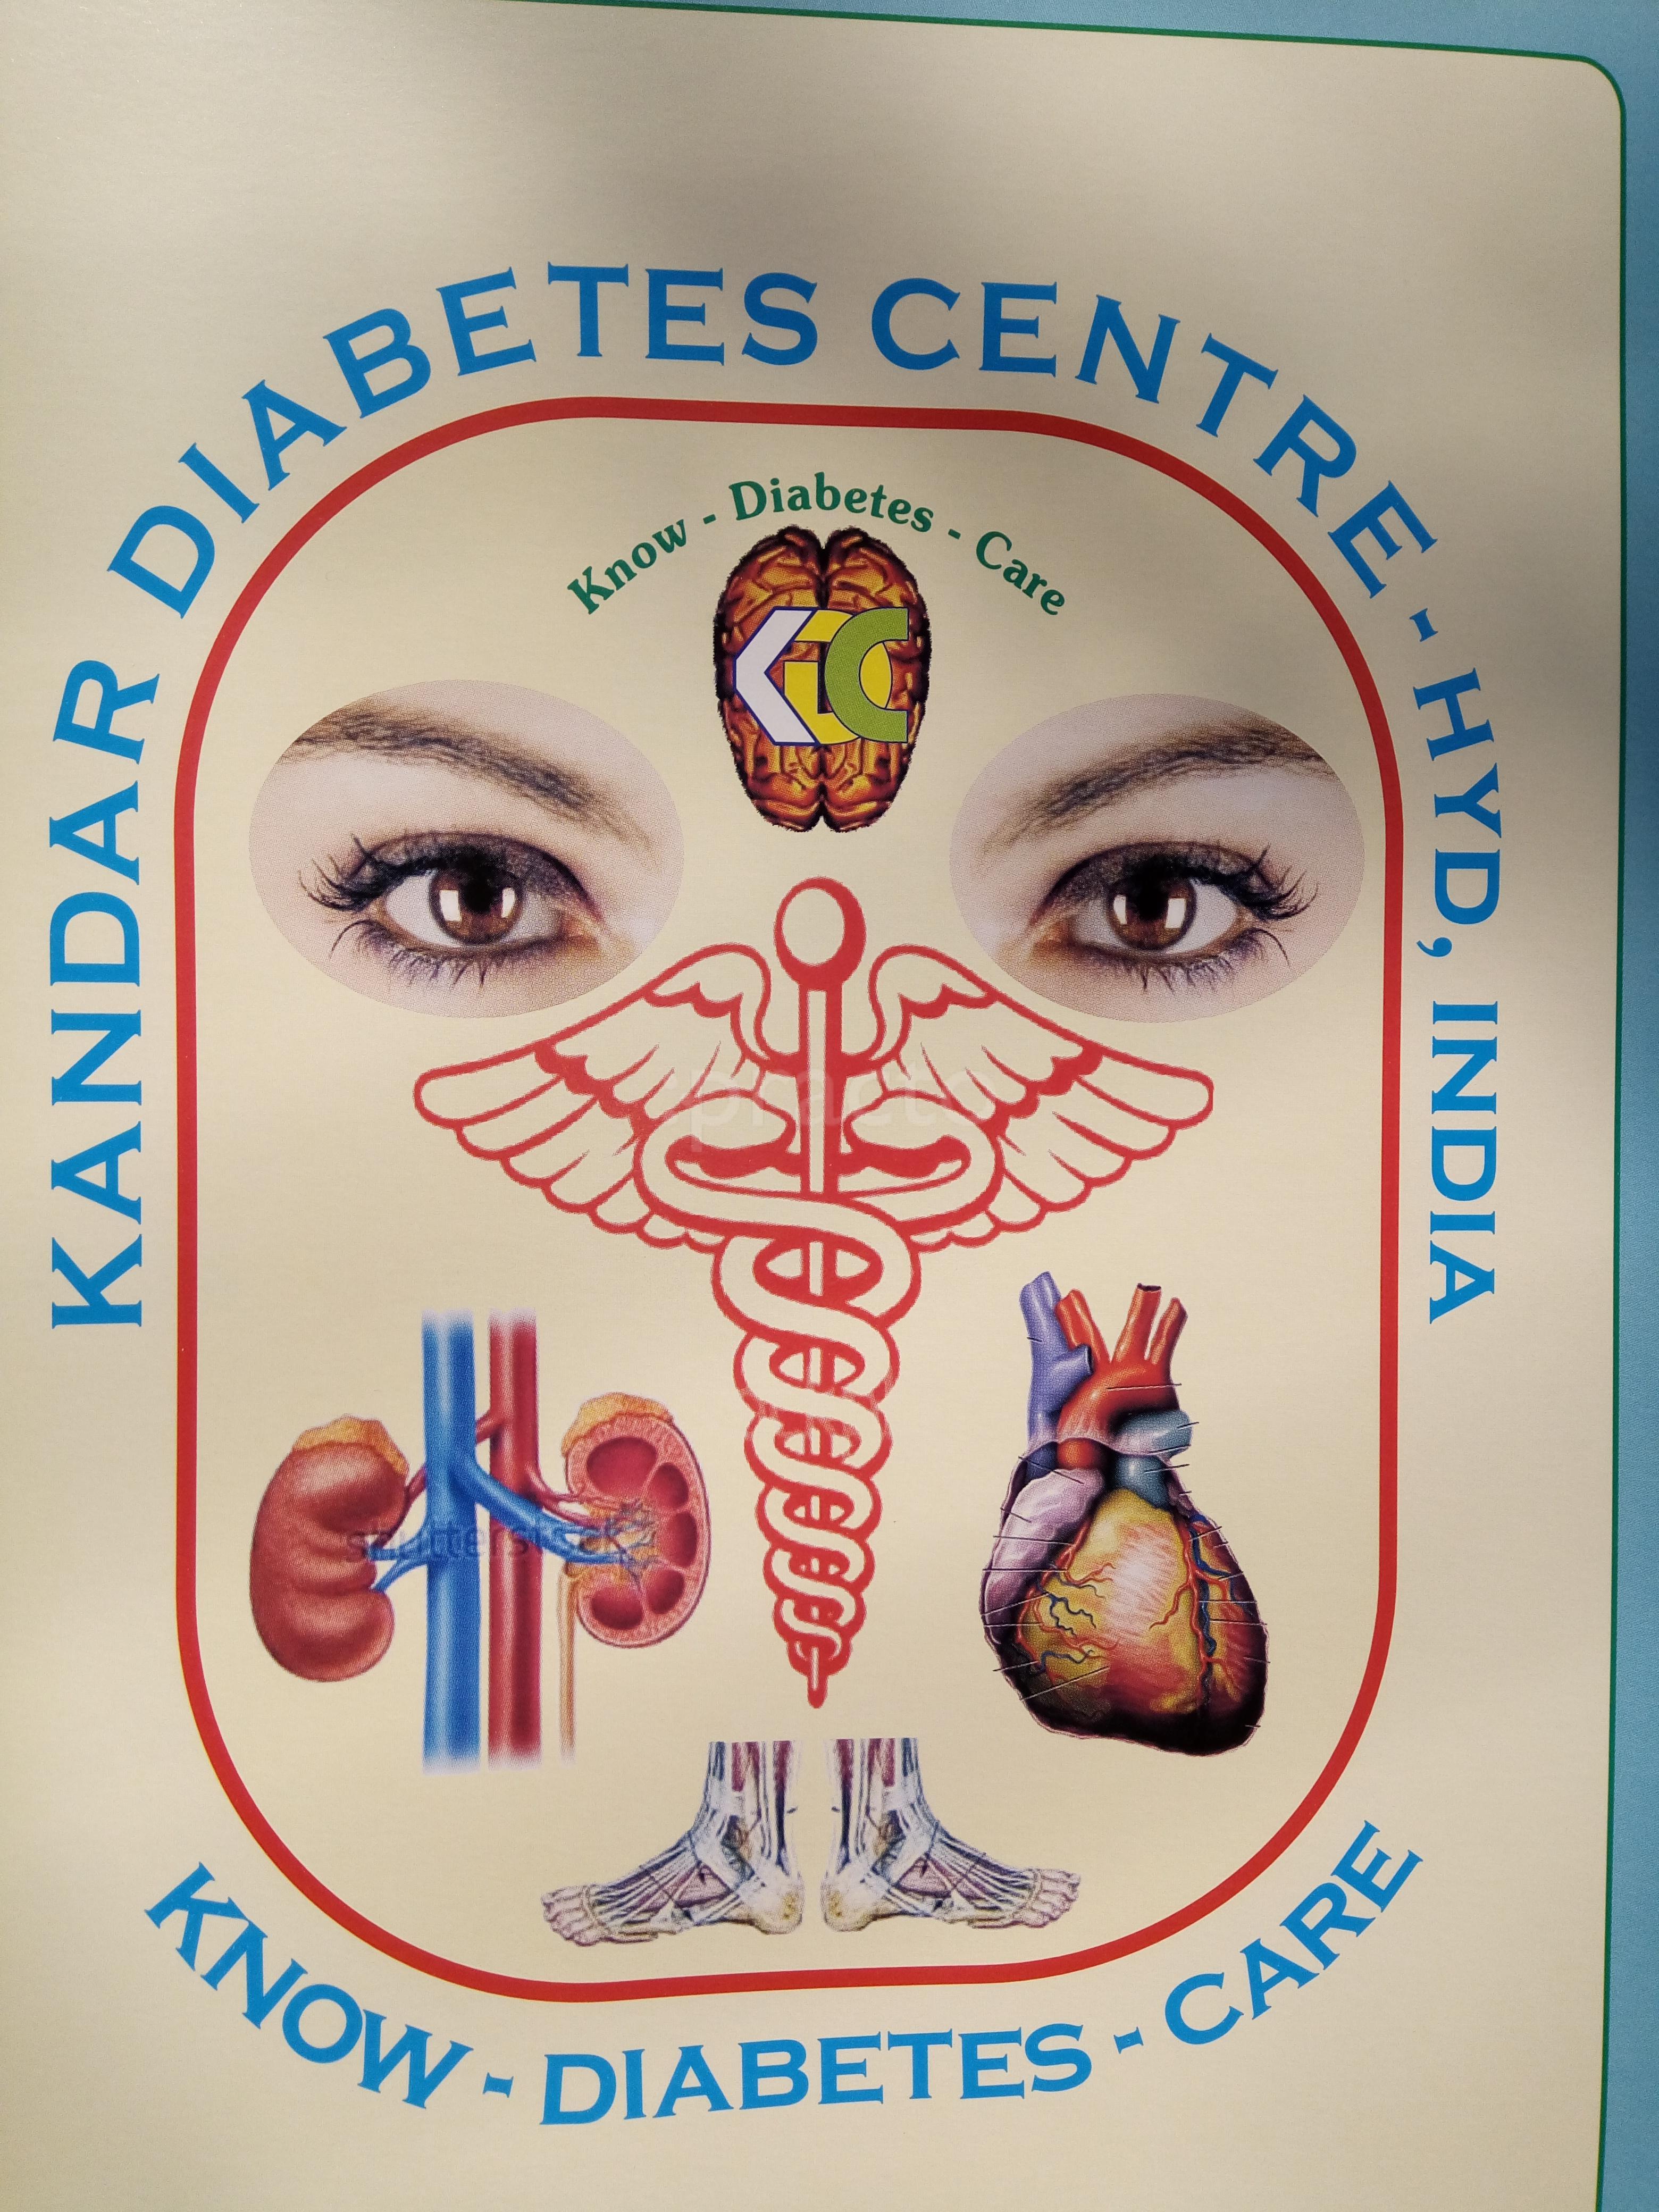 Kandar Diabetes Centre